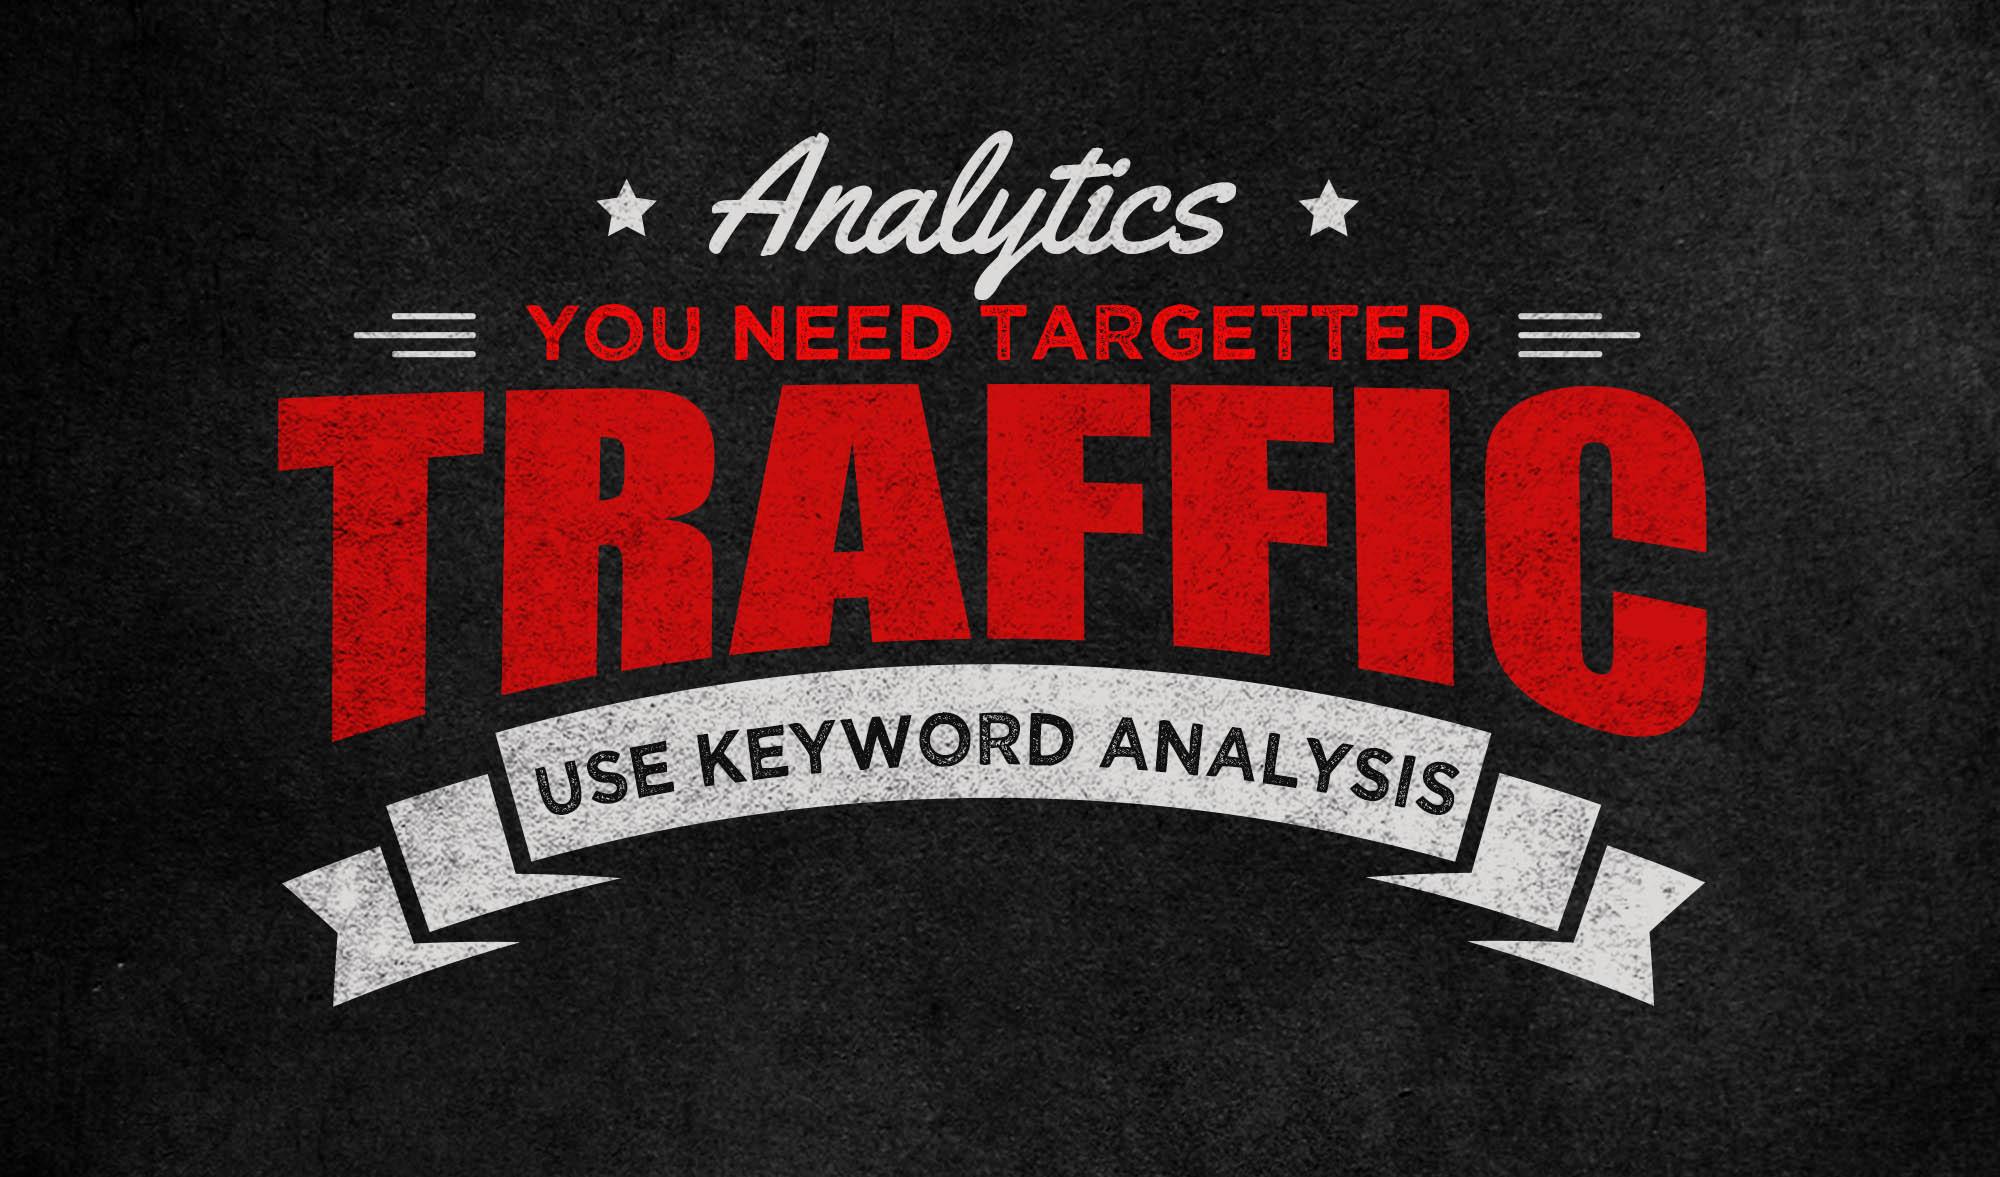 Analytics are key